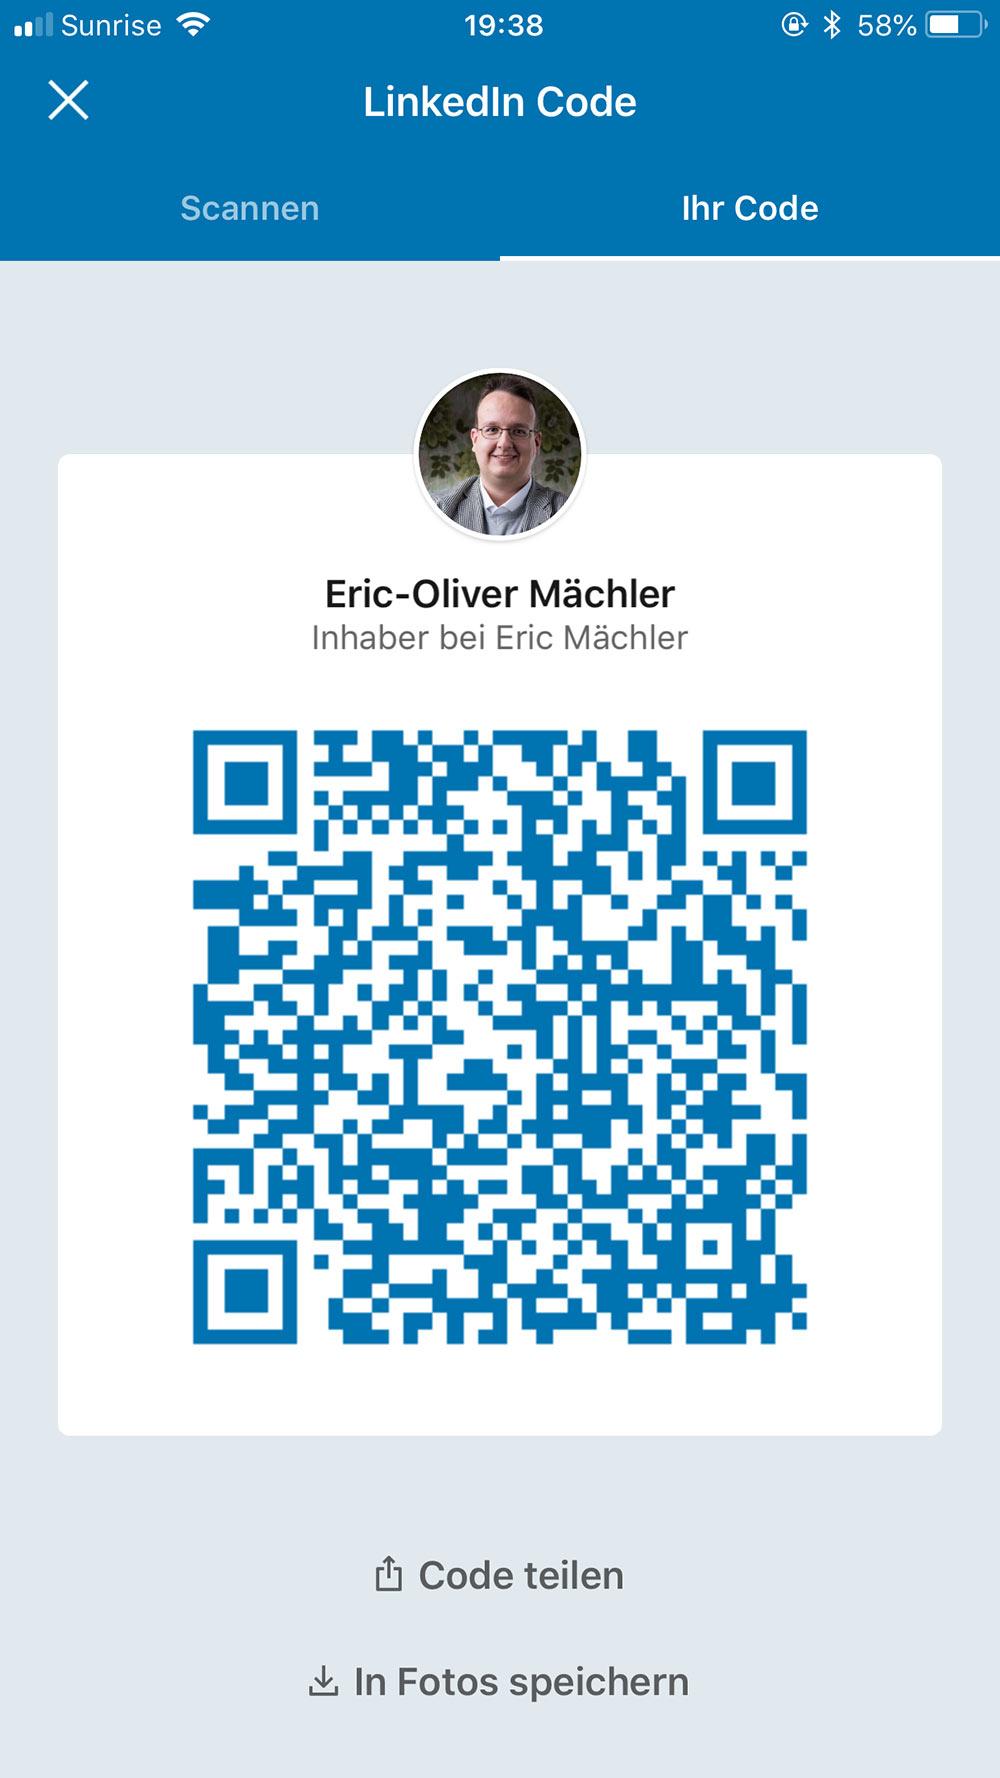 linkedin qr code 3 - LinkedIn neu mit QR Code